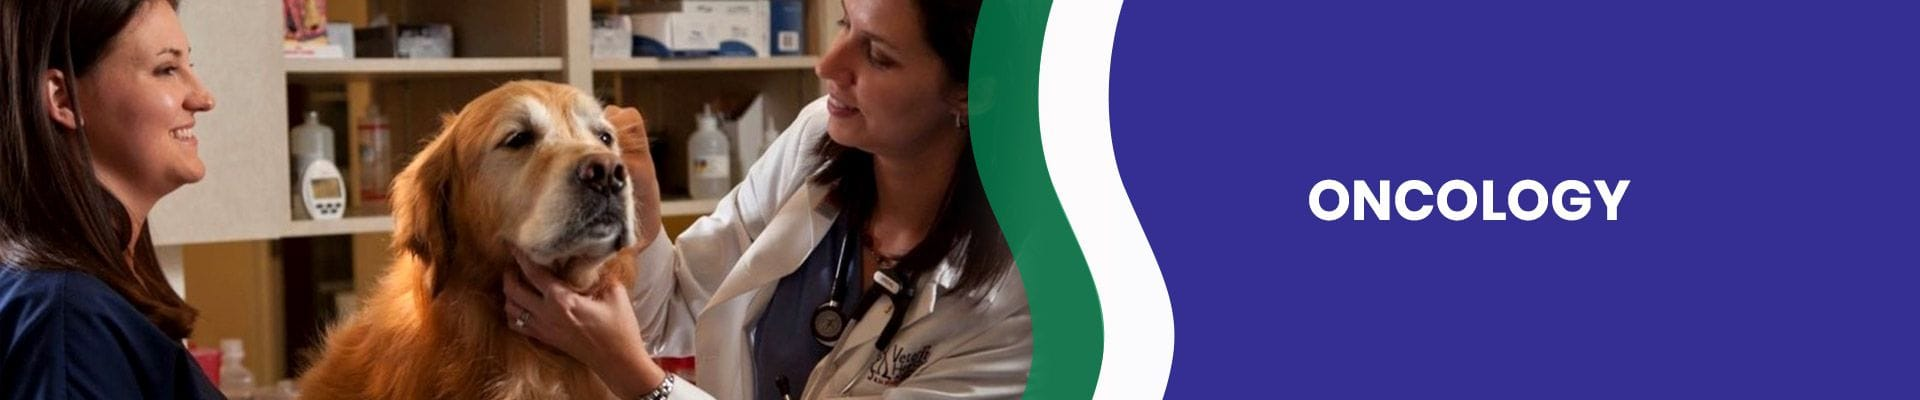 Animal Oncology | Brisbane & Gold Coast Vets